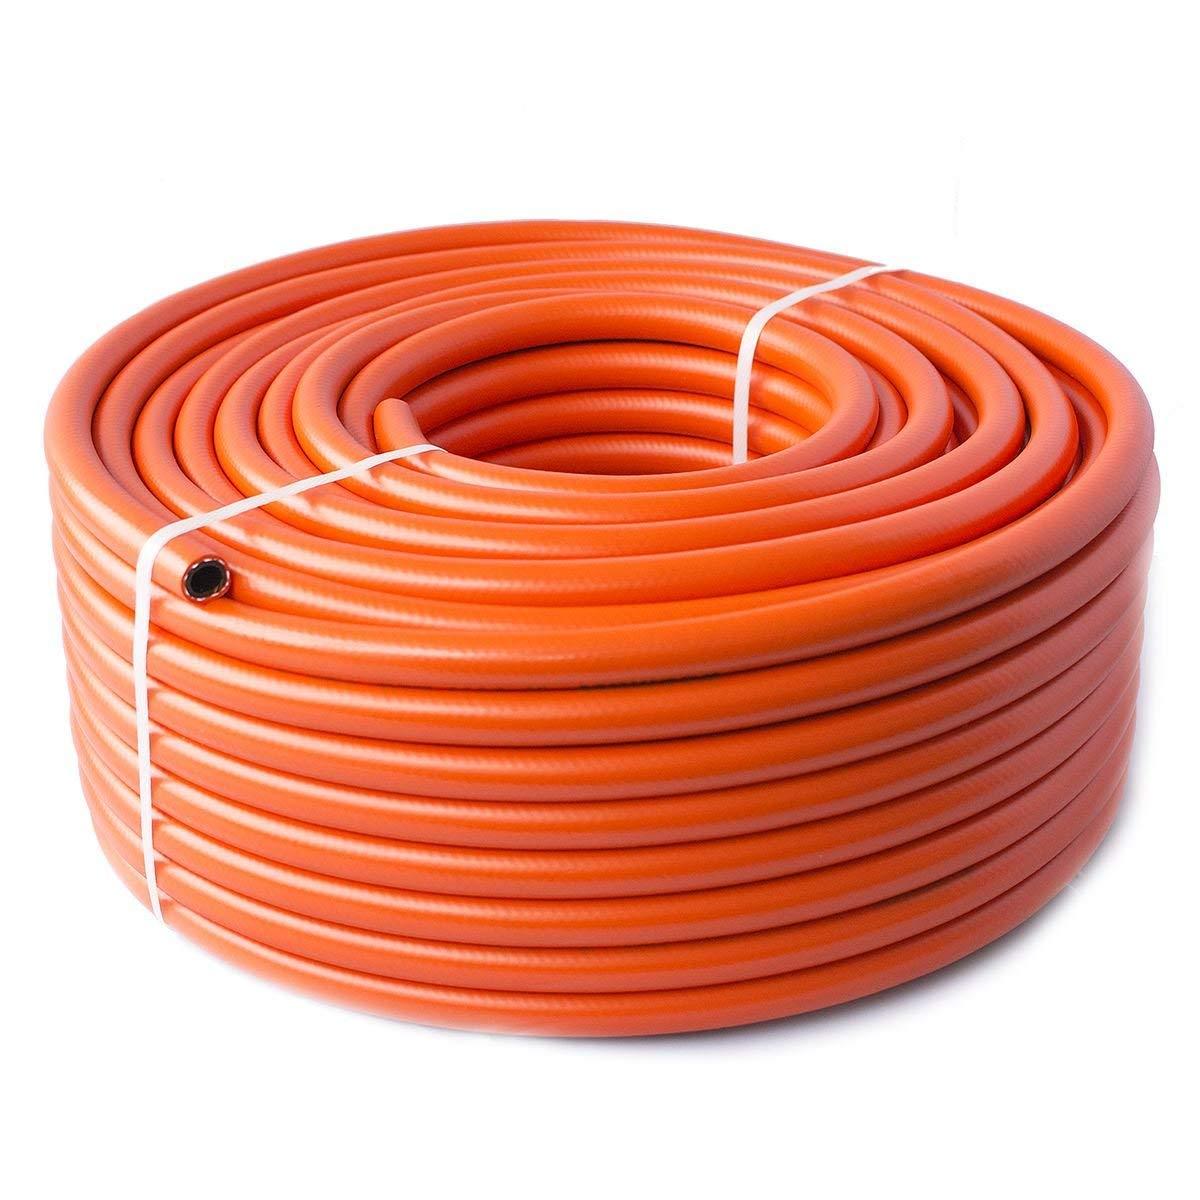 1.6m - Propane Butane LPG Gas hose pipe for Camping Caravan BBQ - High pressure - 8 mm Quantum Garden